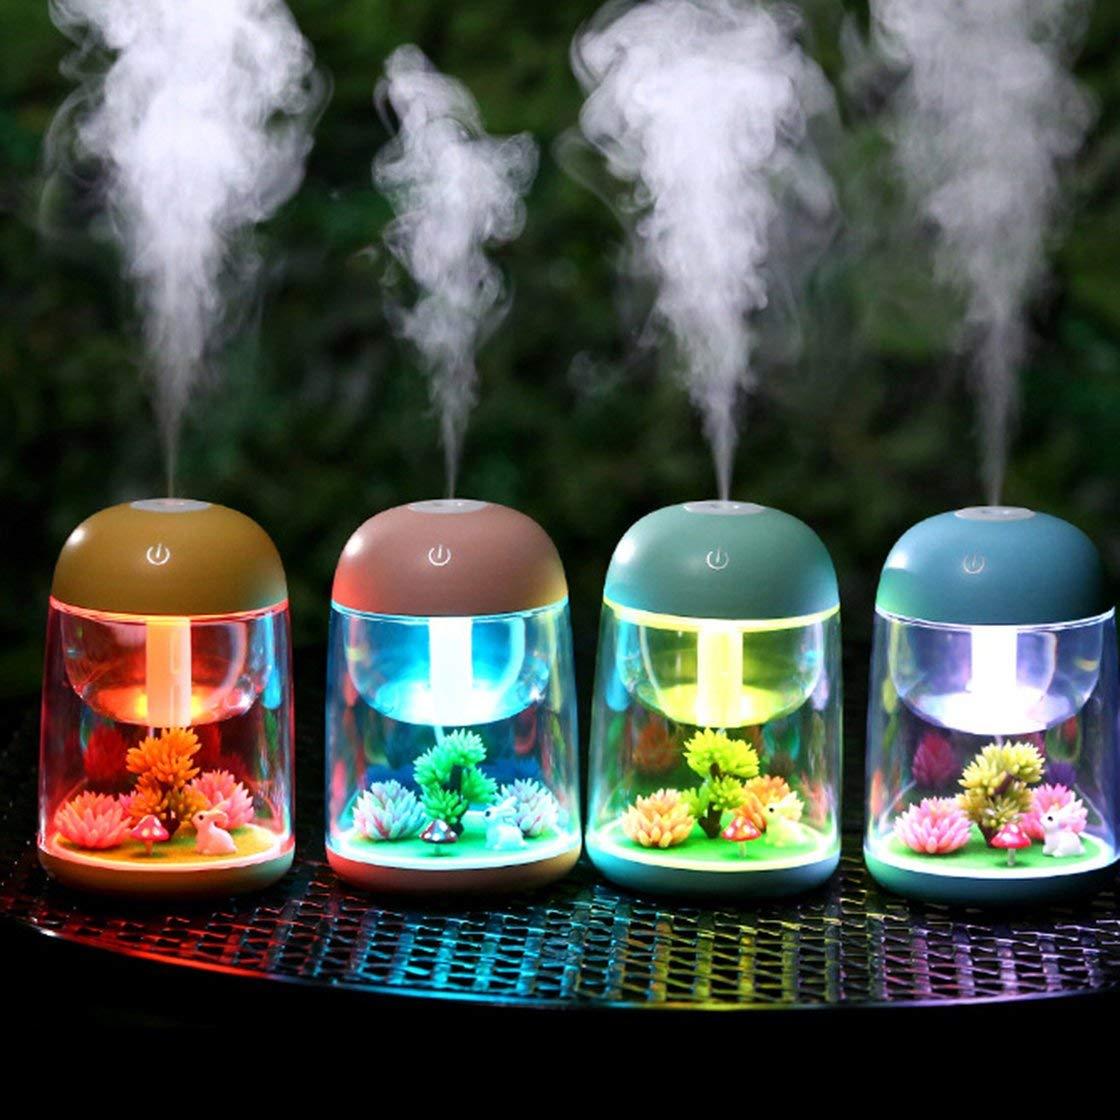 Gwendoll Mini USB Ultrasons Humidificateur Sp/écial Design Air Humidificateur Aroma Diffuseur dHuile Essentielle Aromath/érapie pour Office Spa